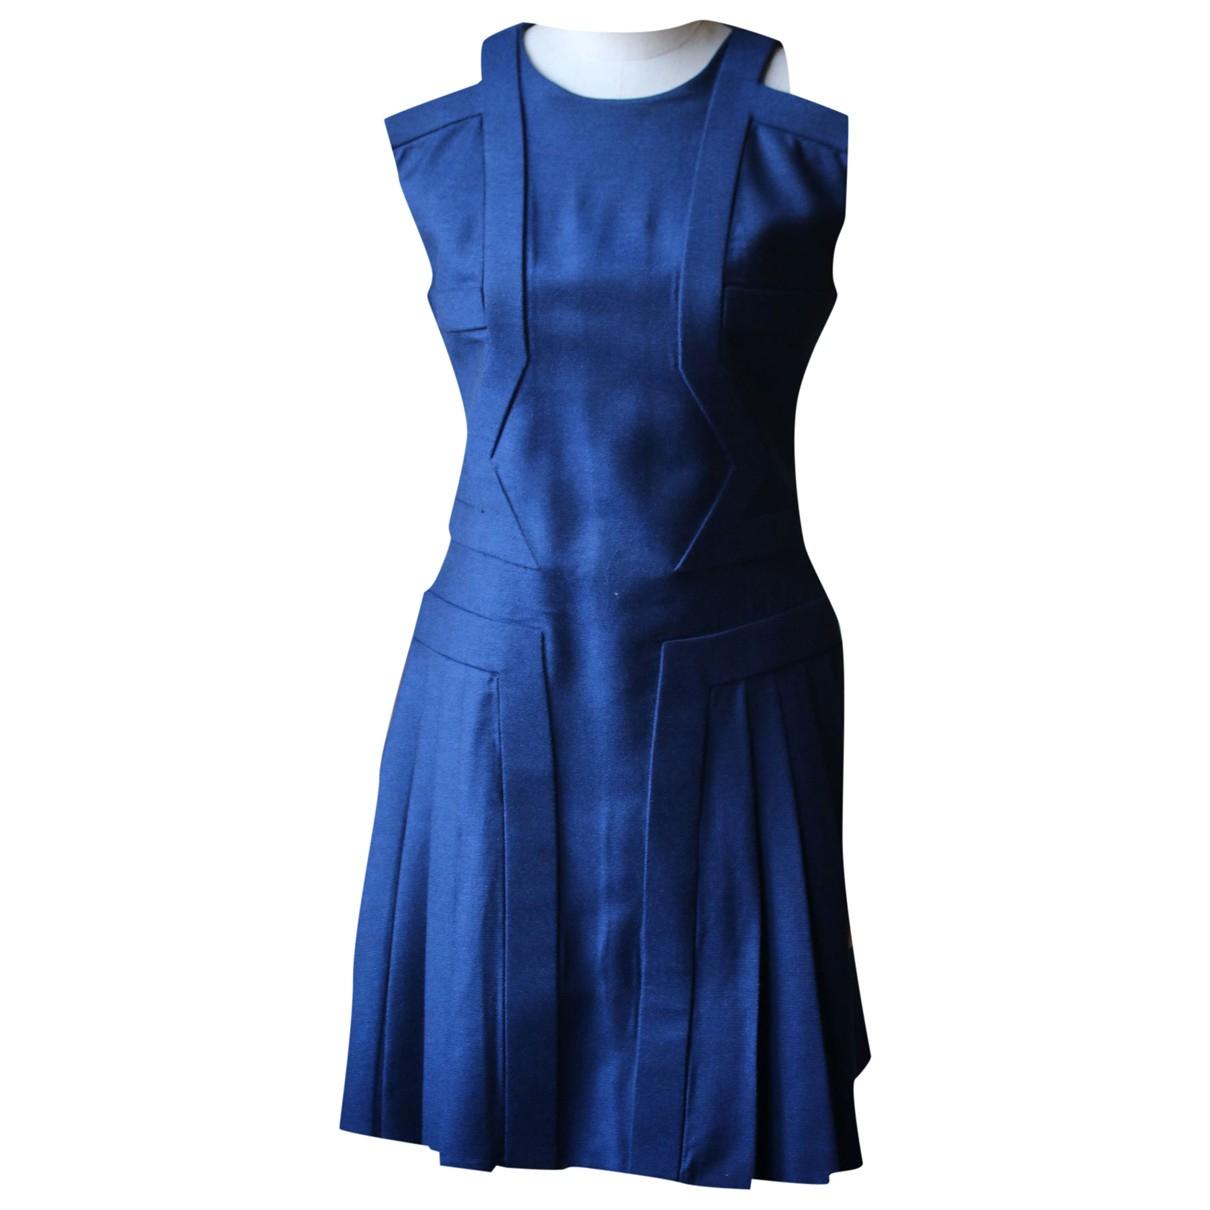 Hakaan - Robe   pour femme en laine - bleu